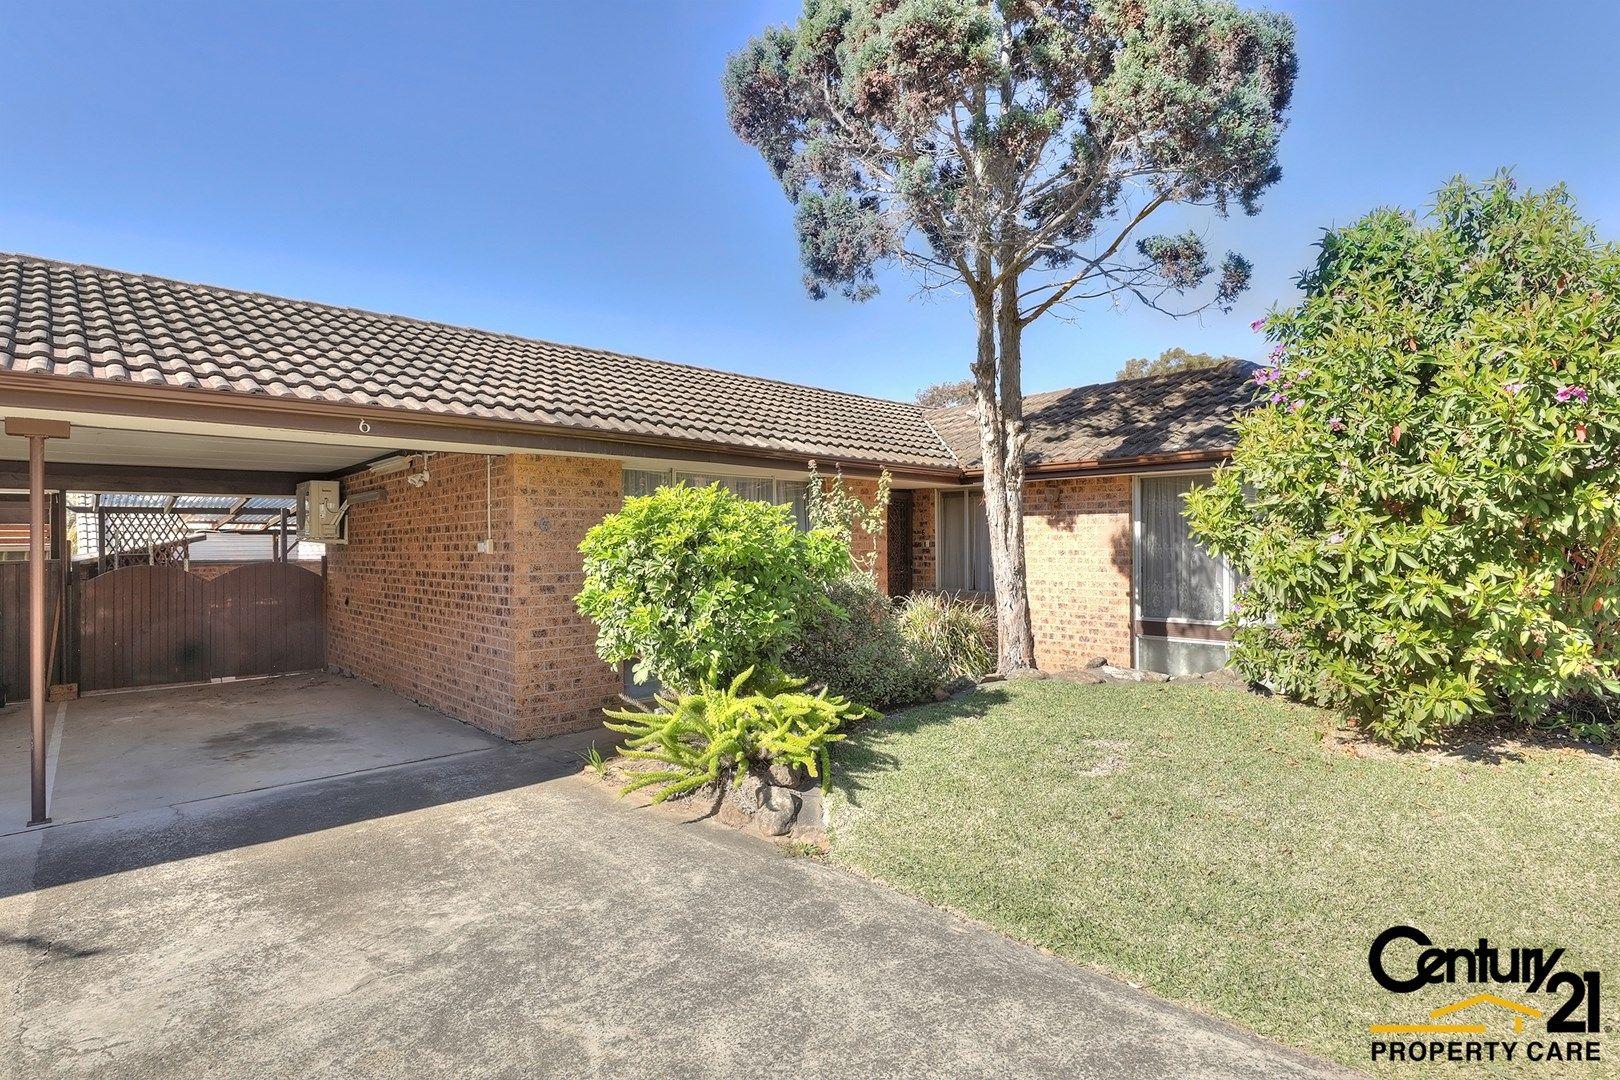 6/21 Second Avenue, Macquarie Fields NSW 2564, Image 0